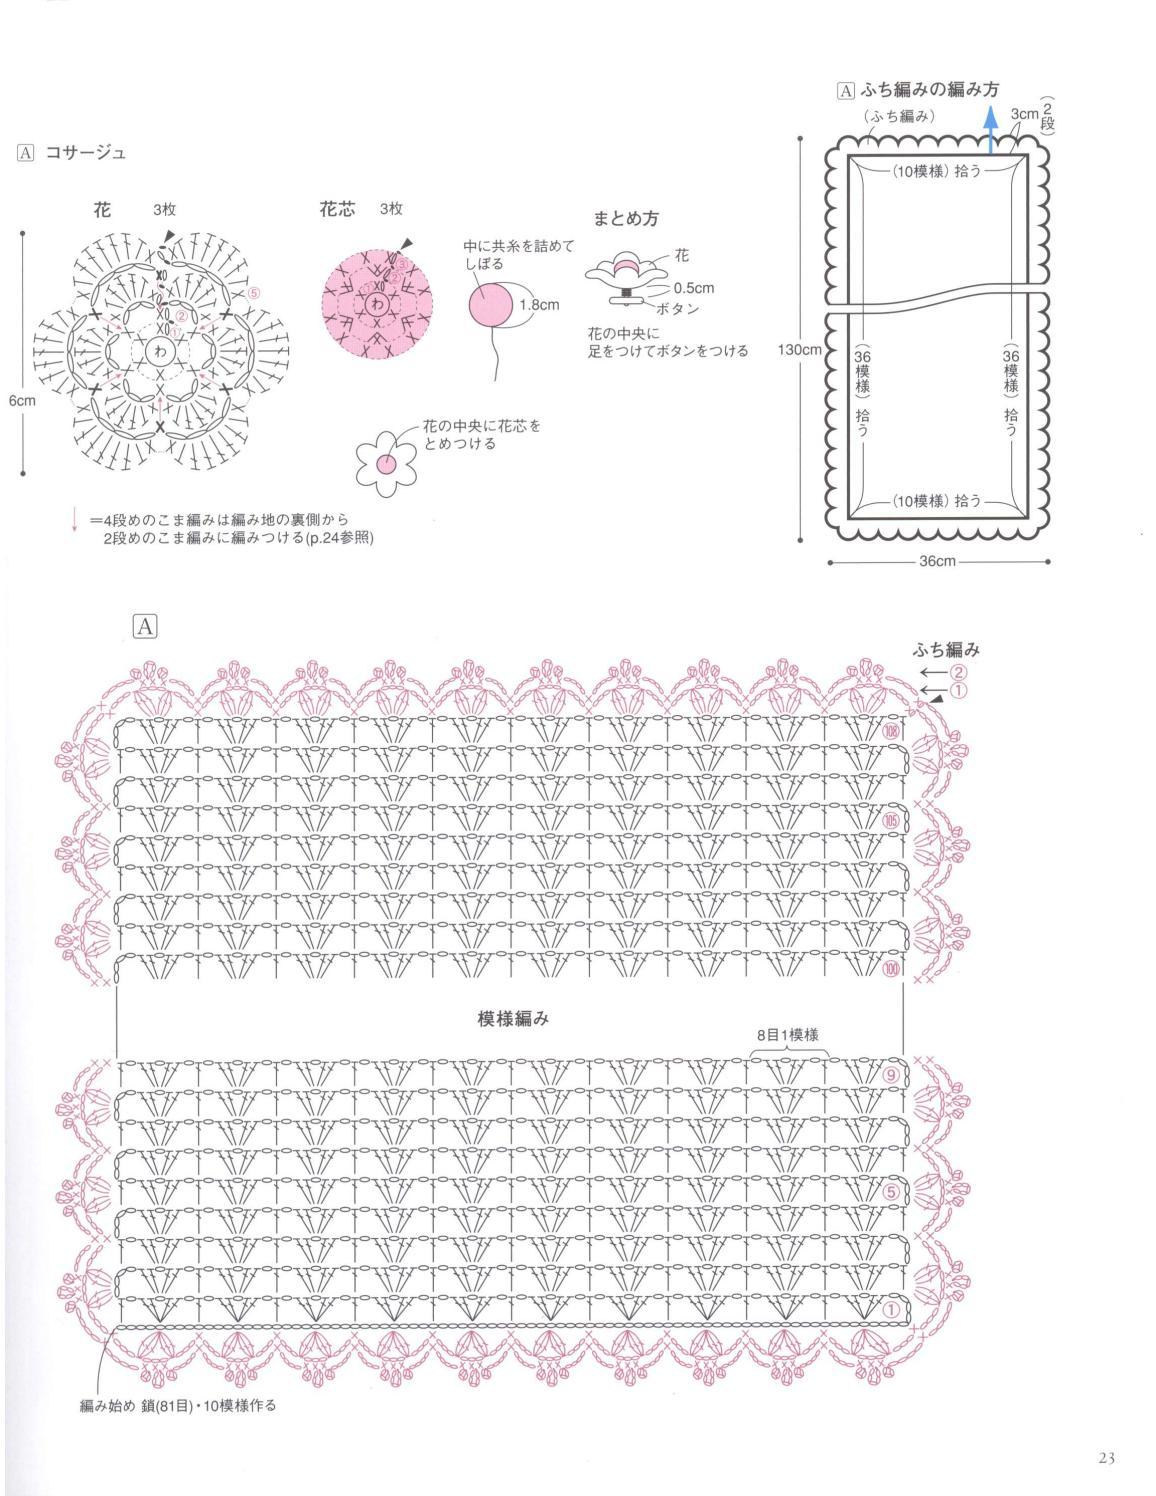 Asahi original crochet best selection 2012 page 23